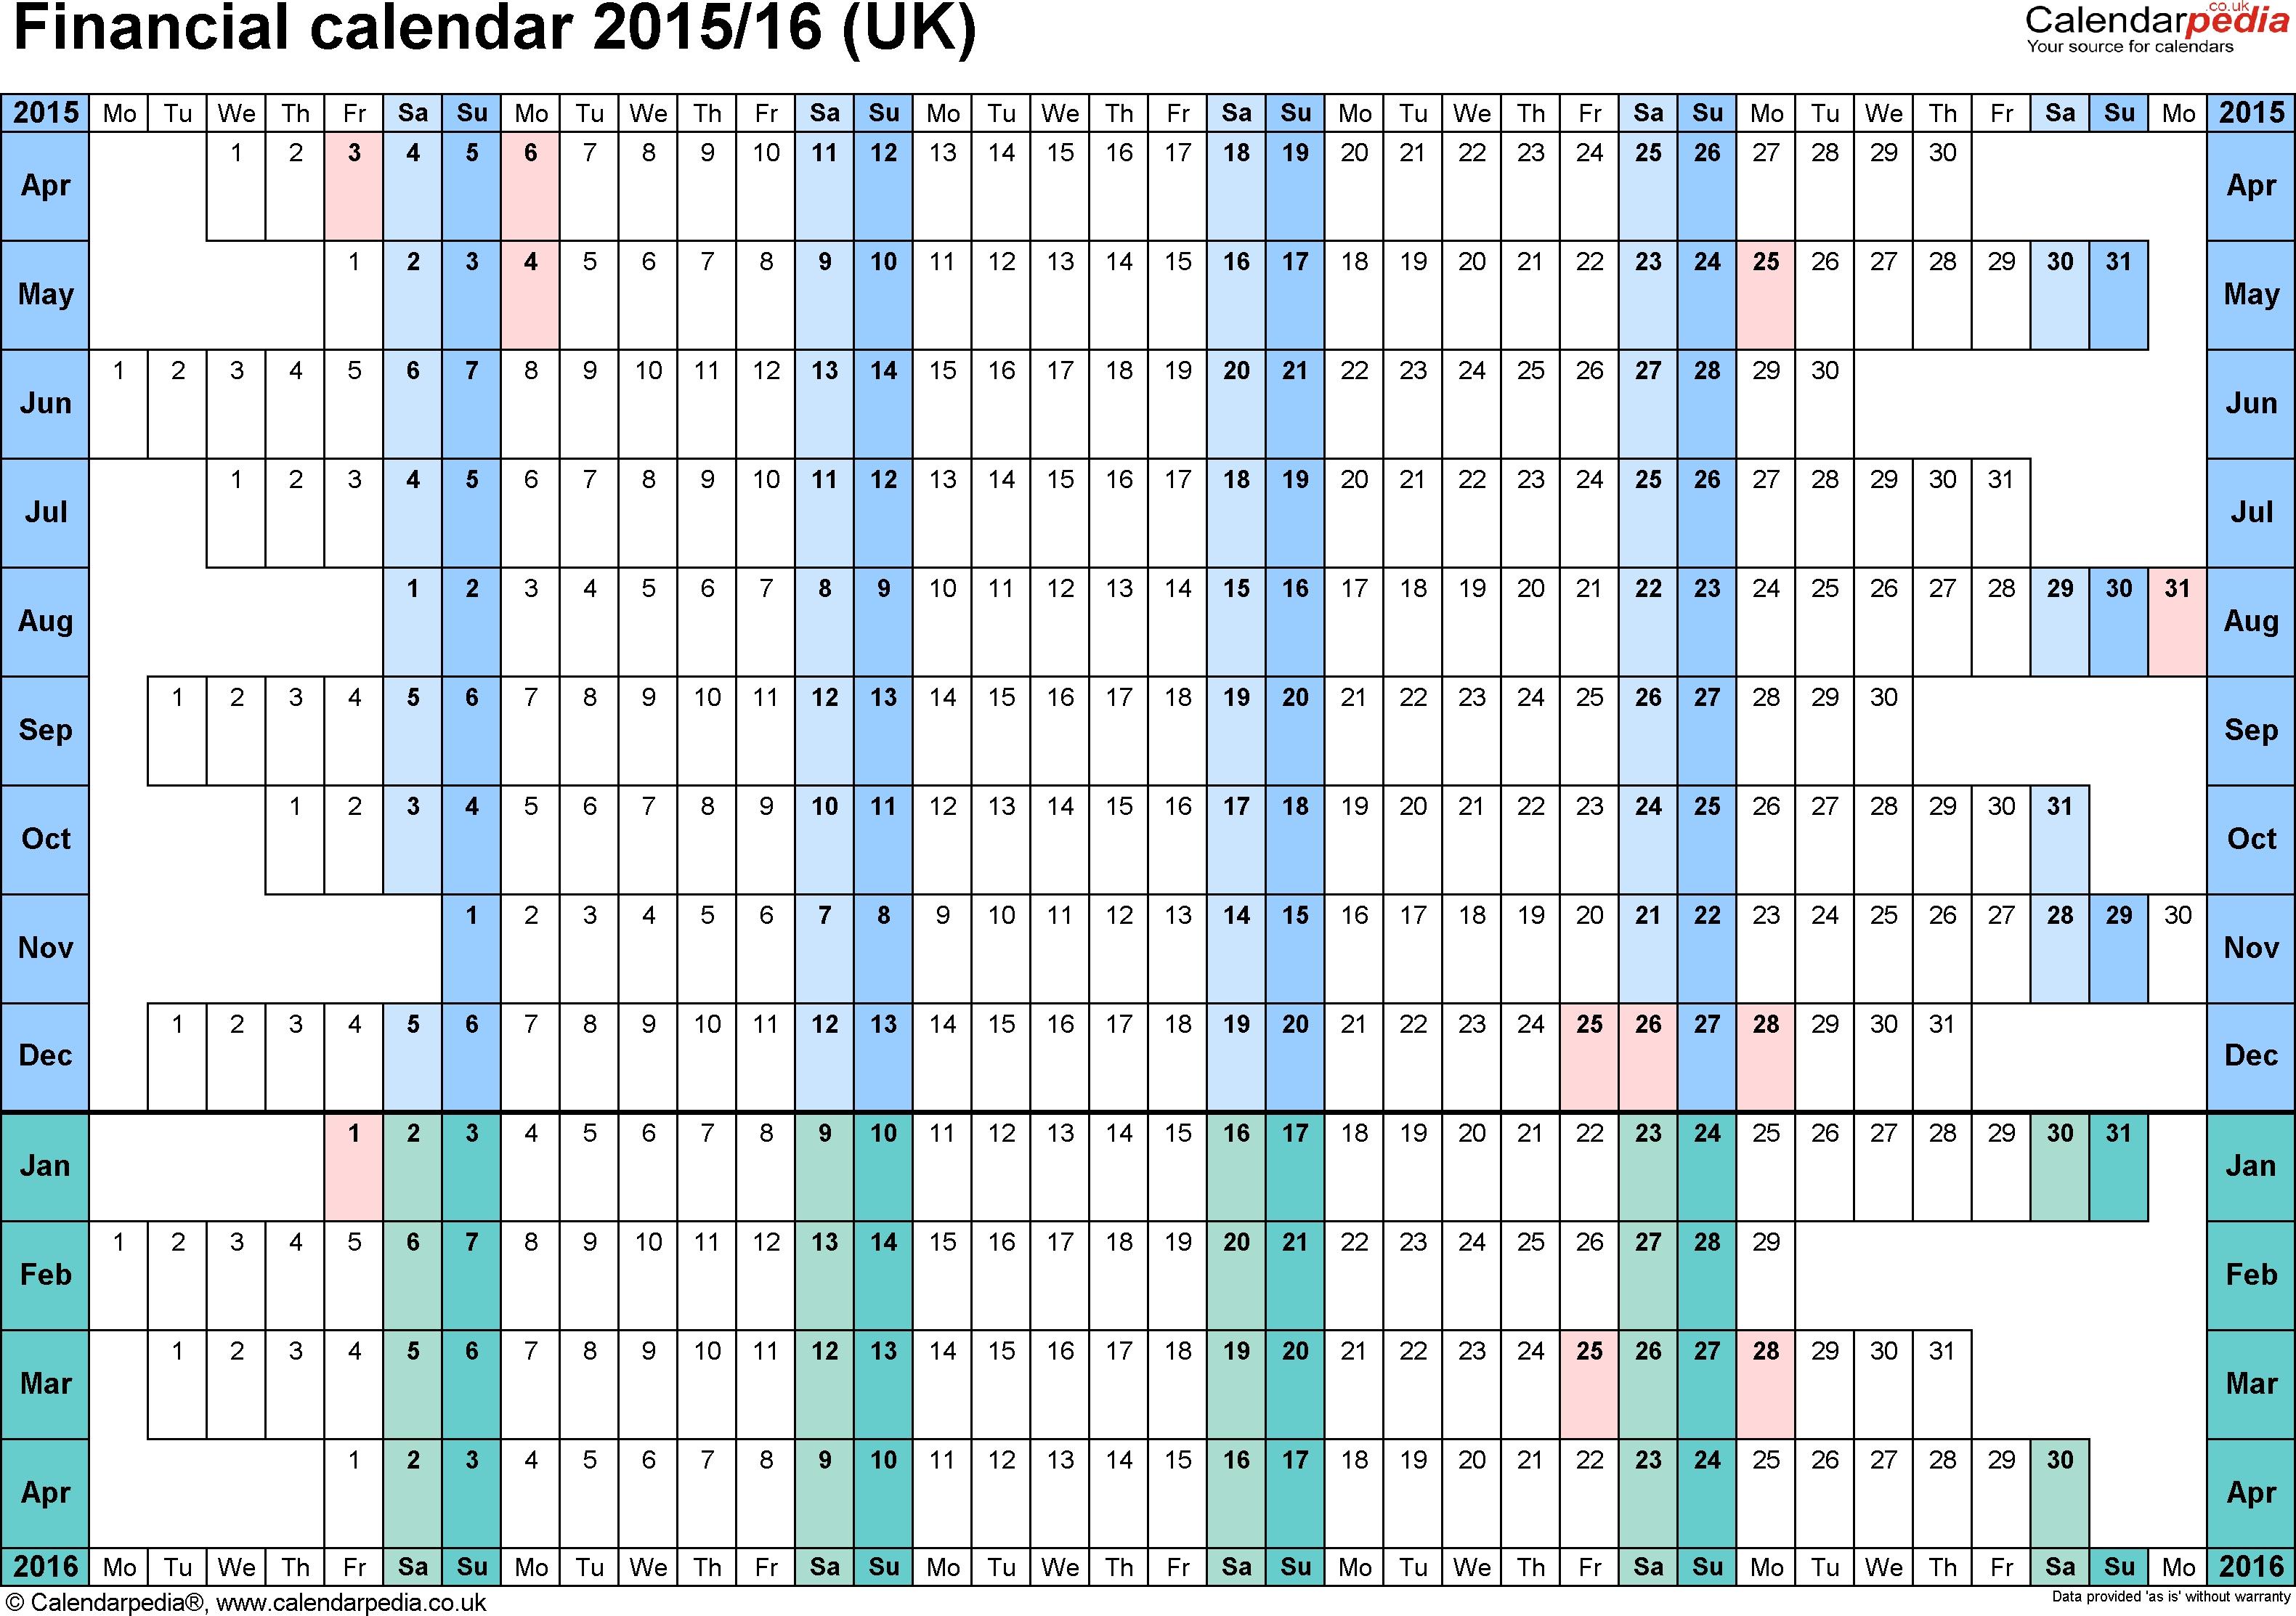 Financial Calendars 2015/16 (Uk) In Pdf Format for Hmrc Calendar 2019 2020